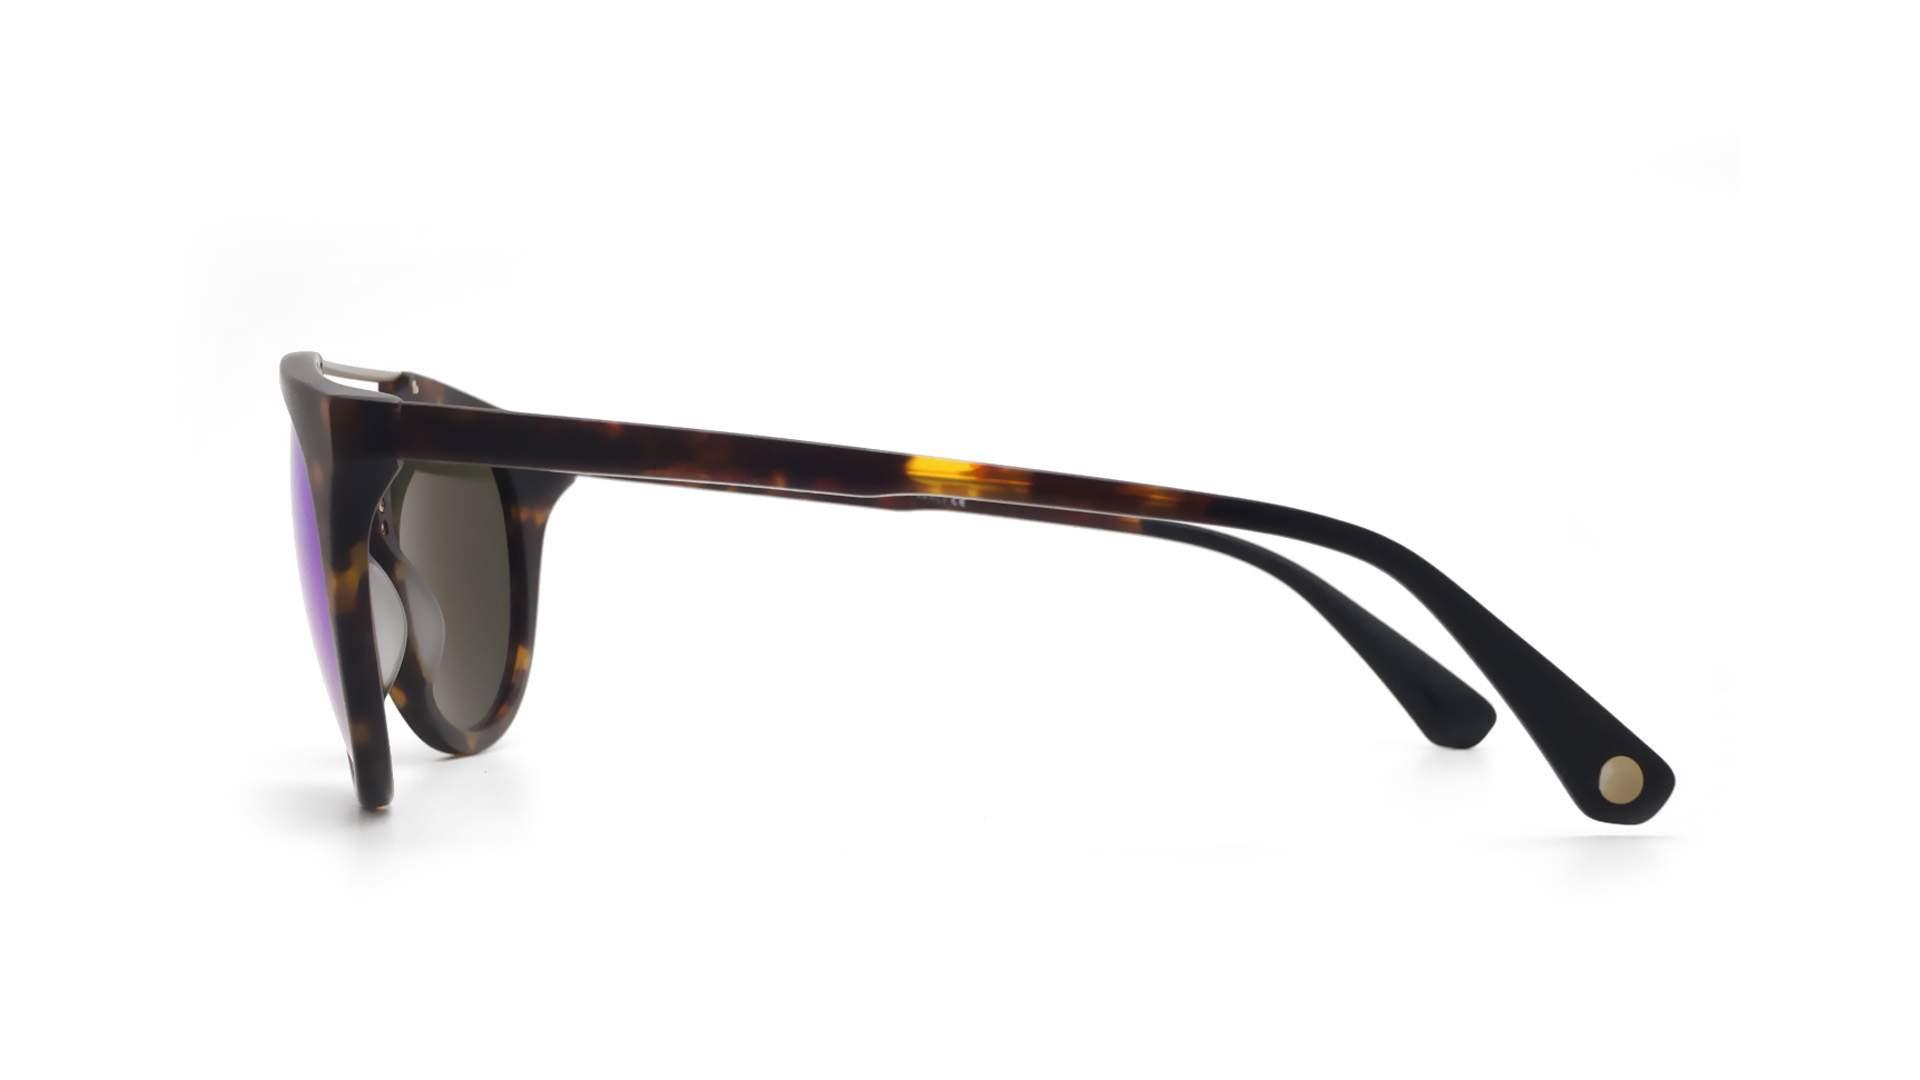 eb88af0c2c1d Sunglasses Vuarnet Cable Car Rag   bone Round Tortoise Matte Polarlynx  VL1602 0008 50-20 Medium Mirror